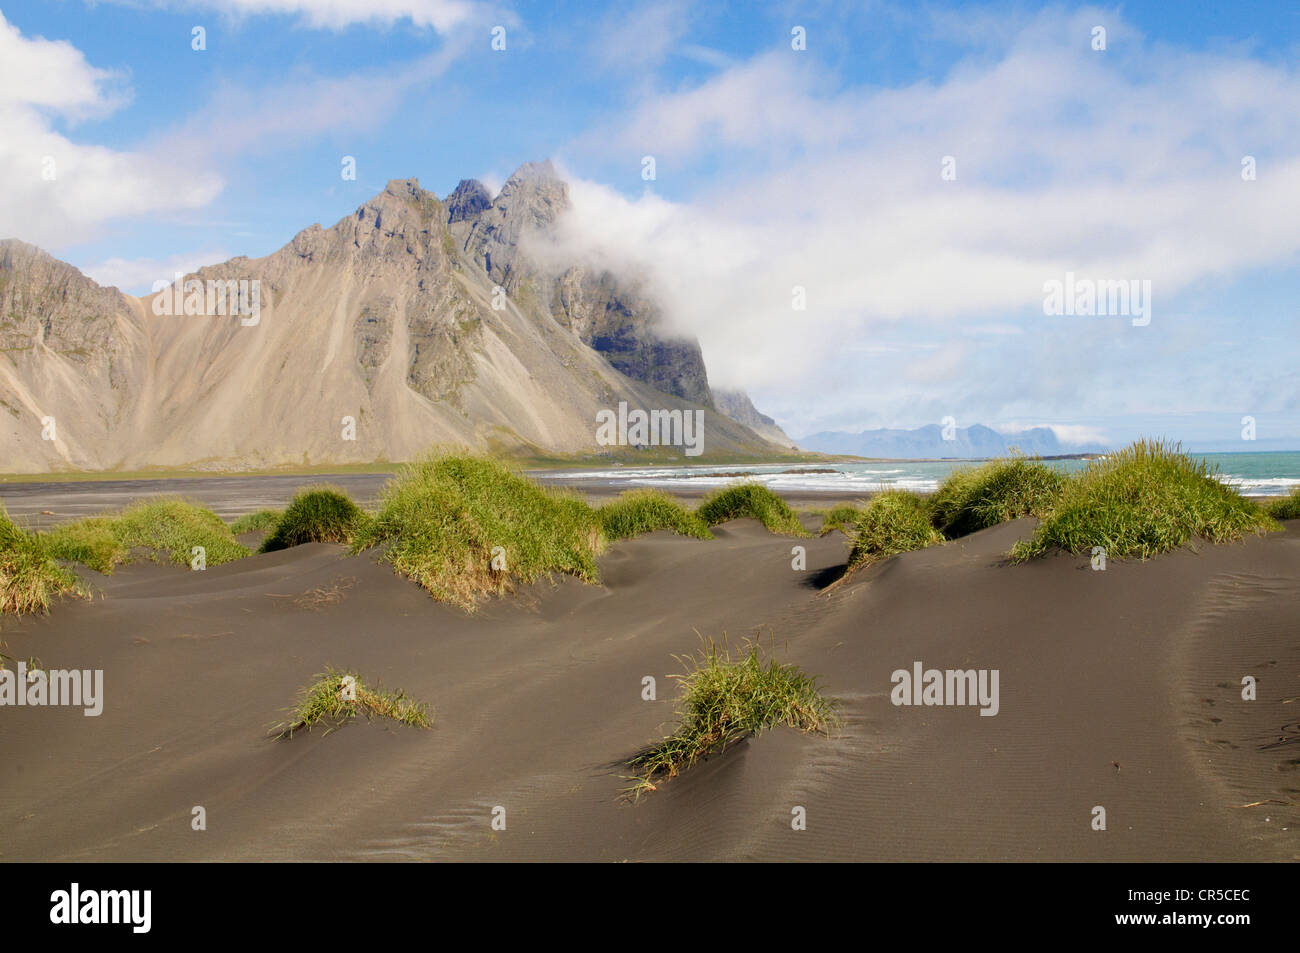 Iceland, Austurland Region, Stokksnes, black sand beach - Stock Image